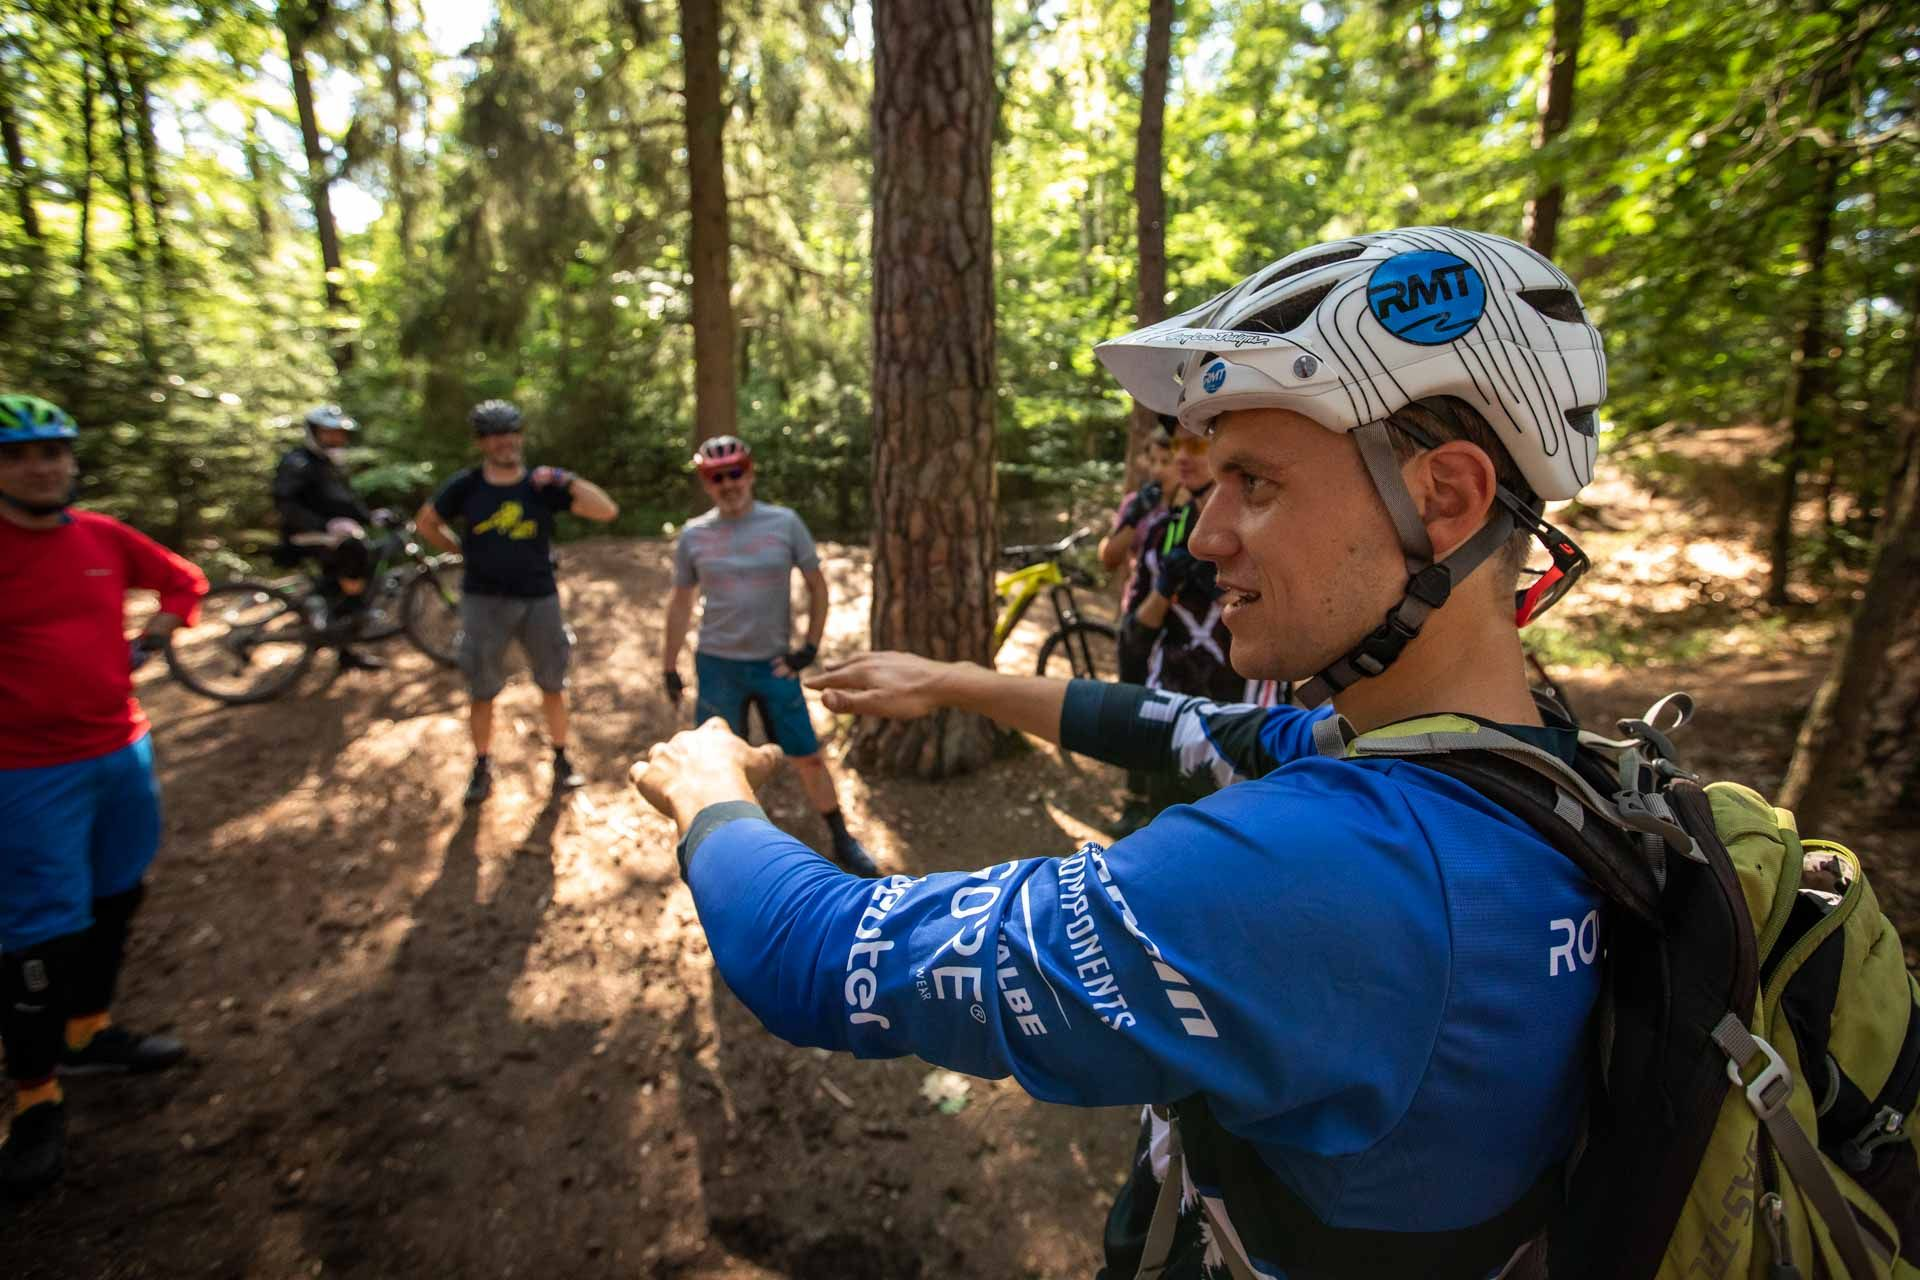 Experten Fahrtechnik Kurs in Nürnberg - Rock my Trail MTB und eBike Bikeschule